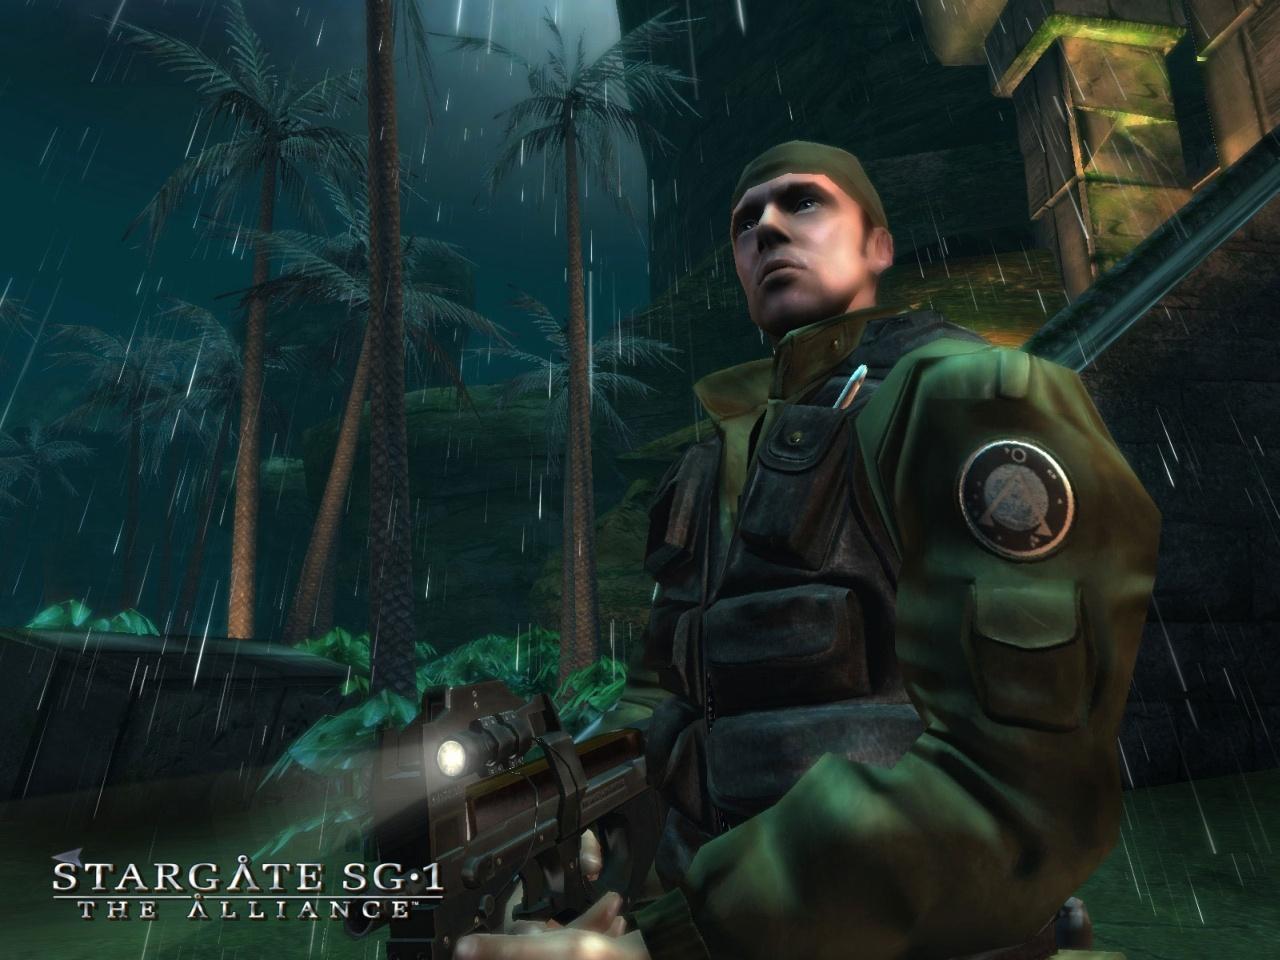 Games: Stargate SG-1: The Alliance - 010